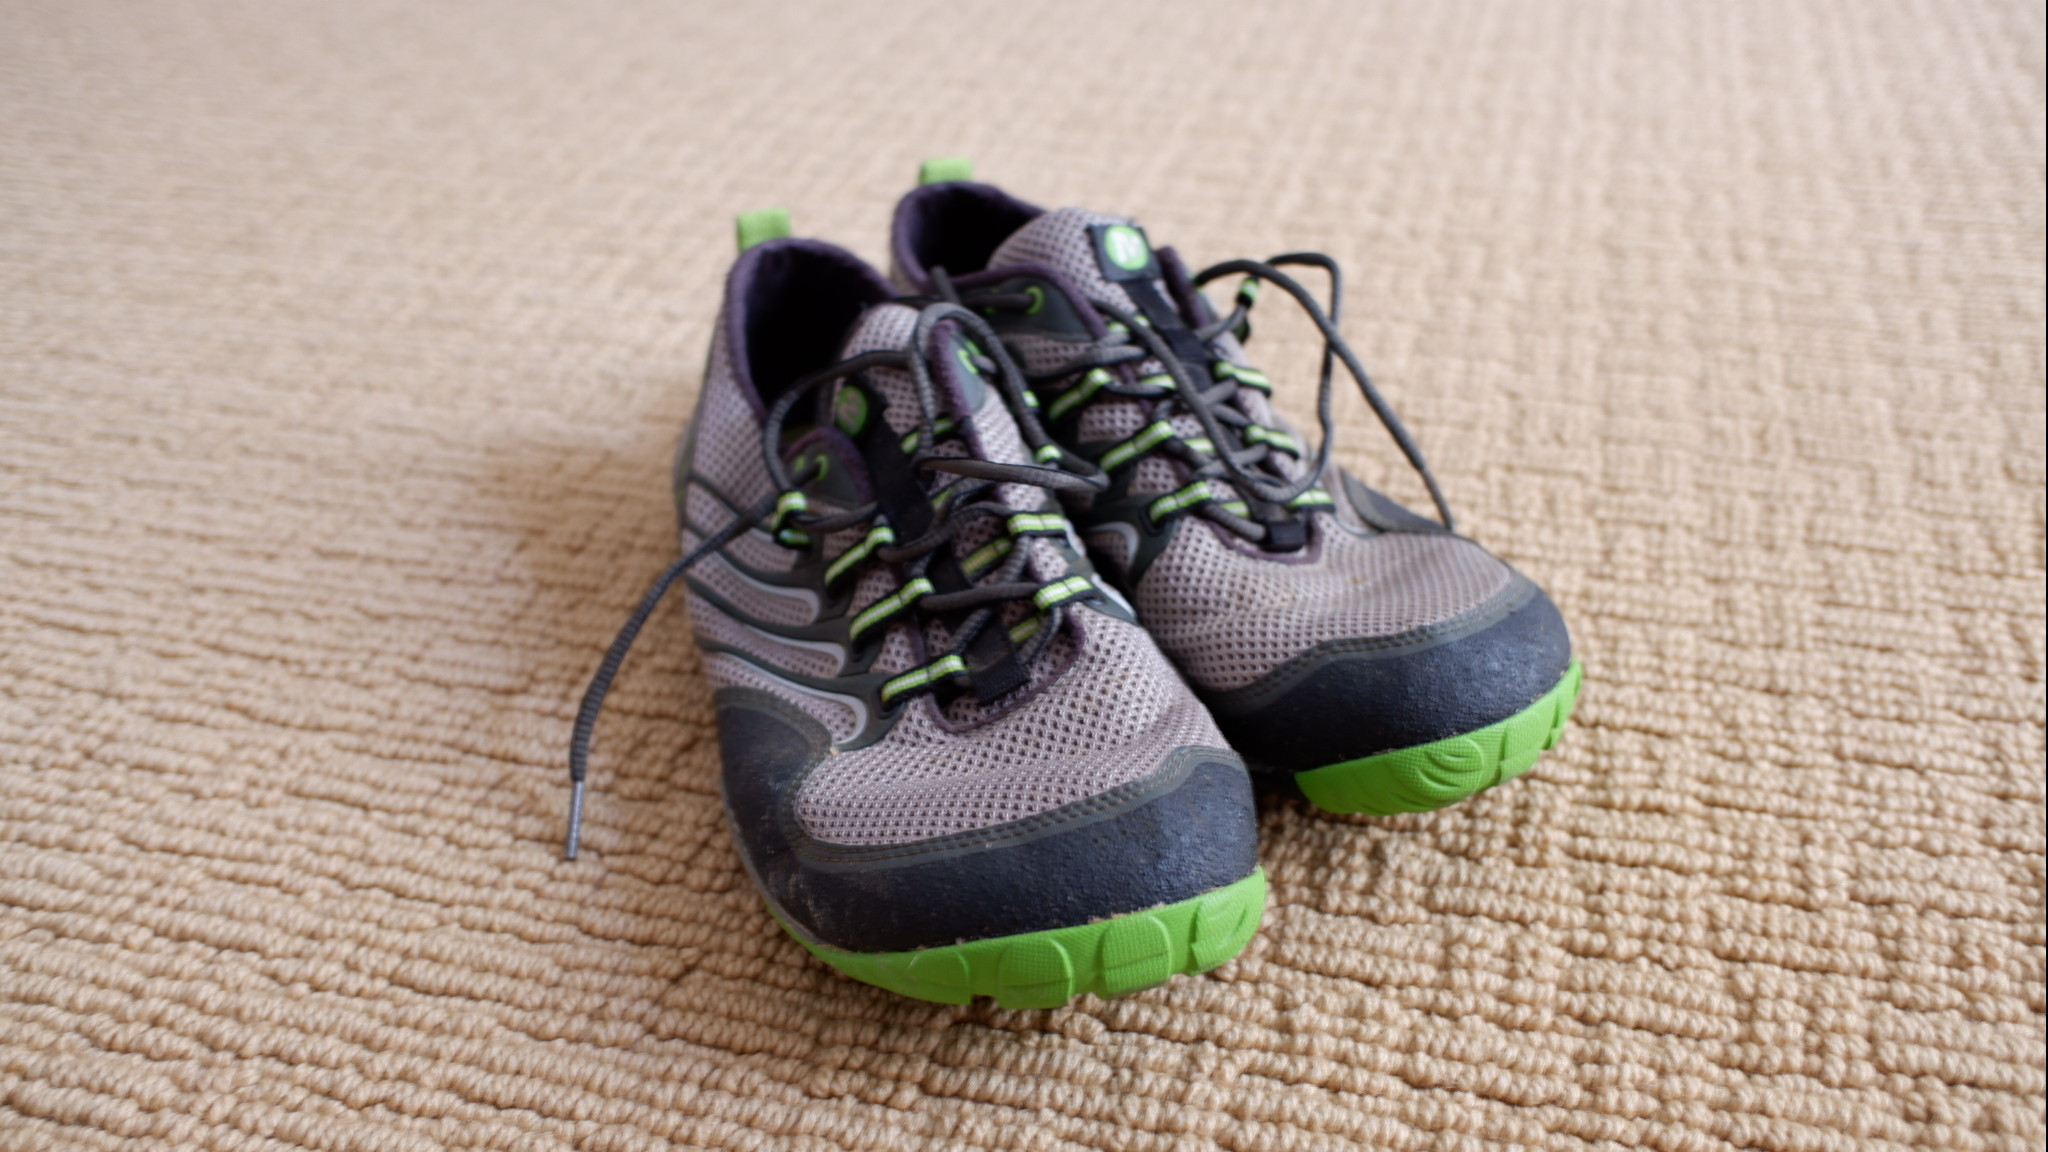 Merril Barefoot